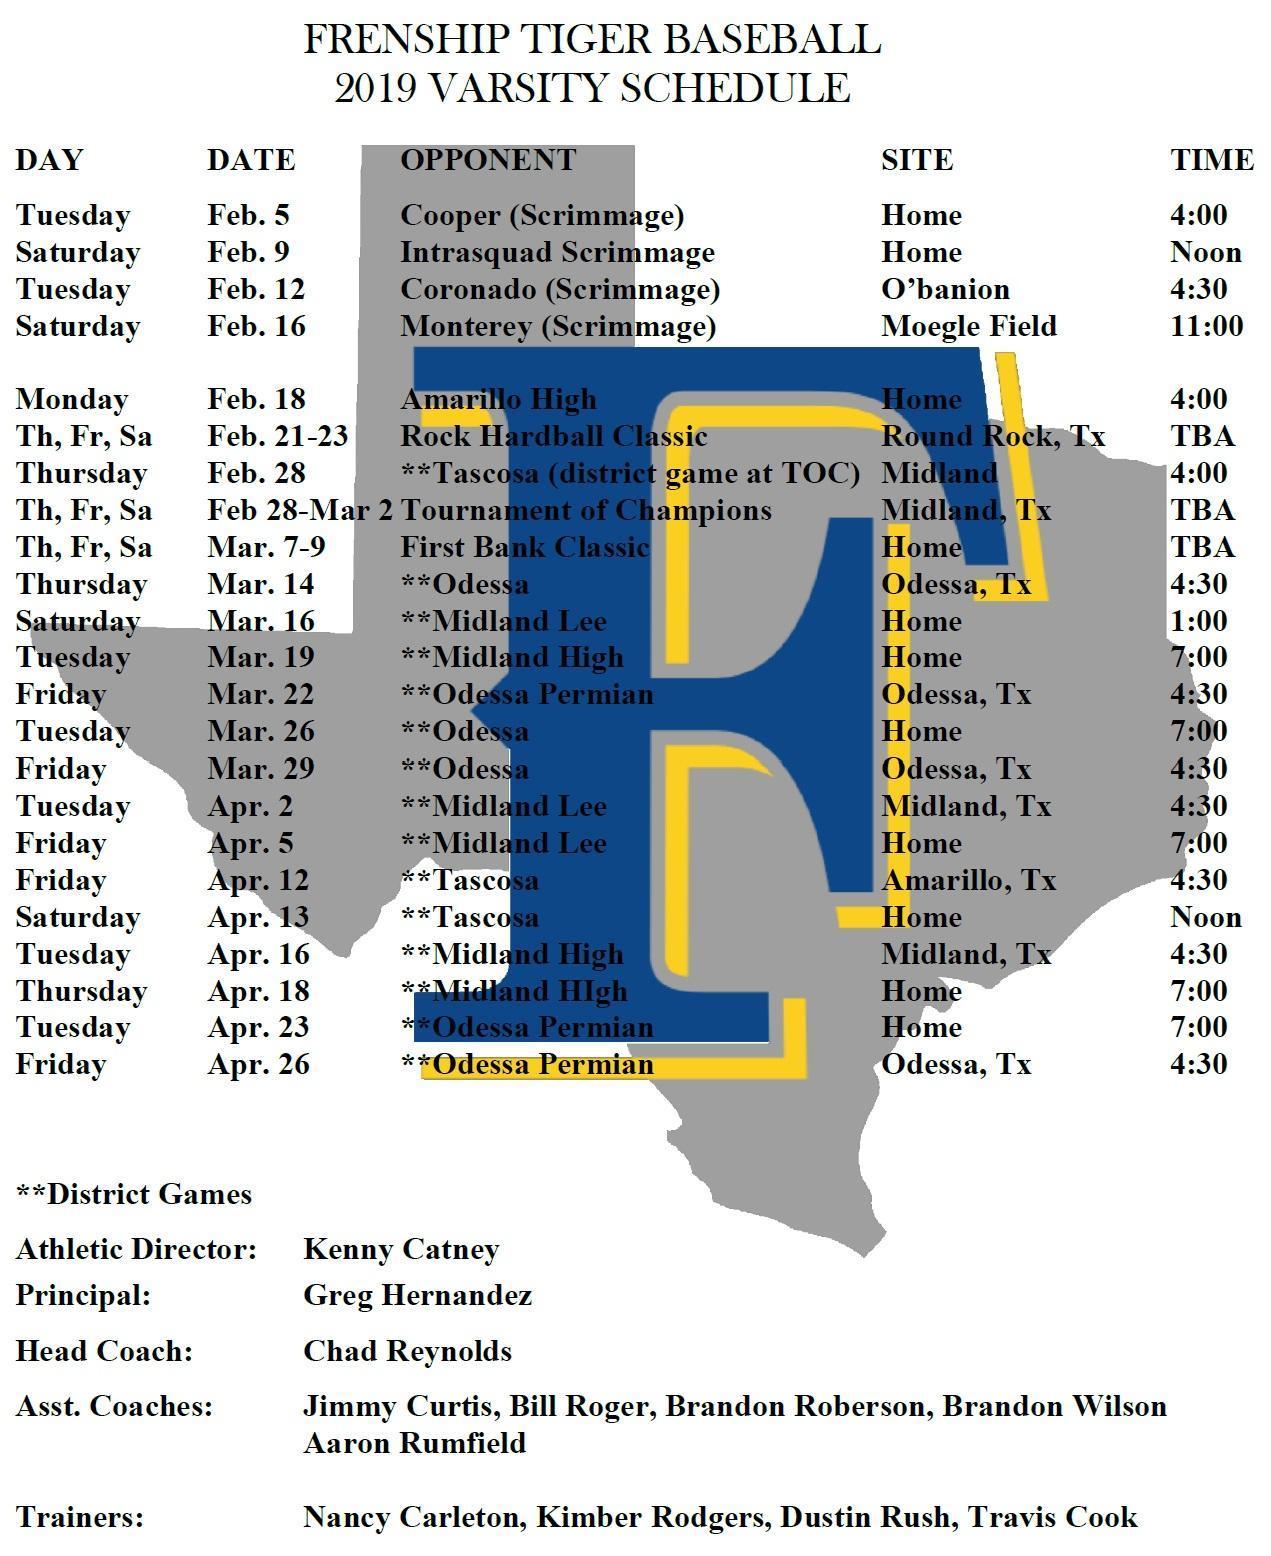 Frenship Baseball 2019 Varsity Schedule